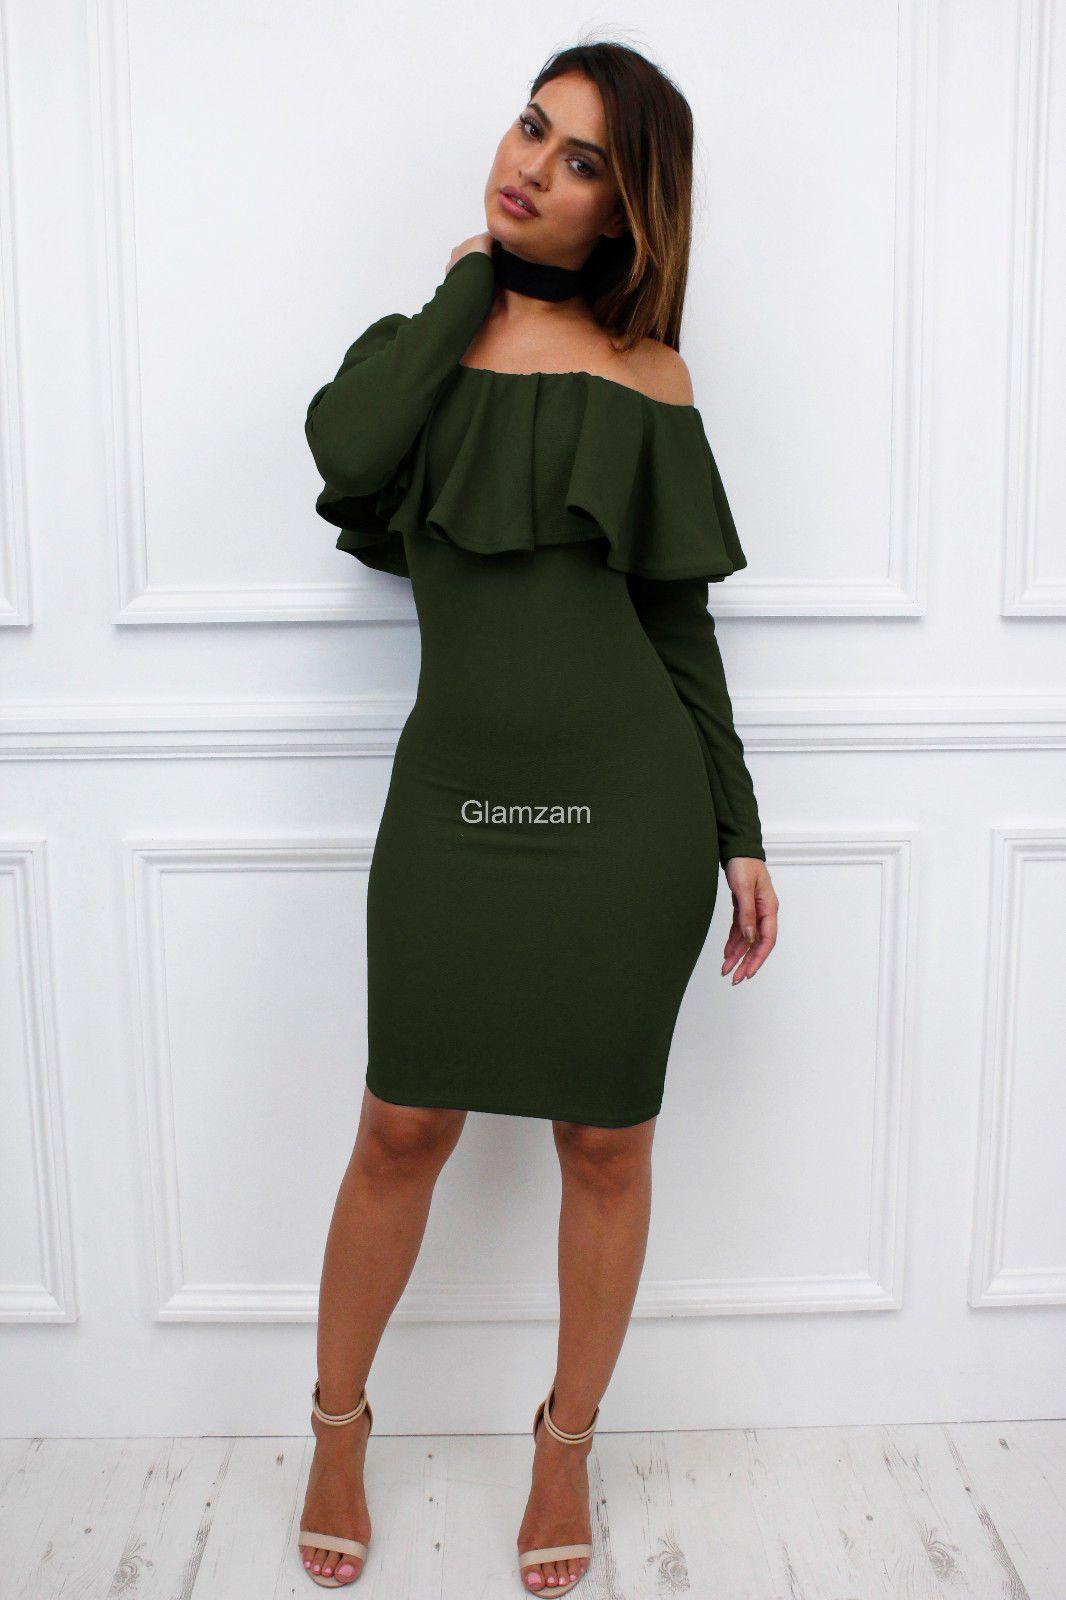 b806fdd497da Glamzam Womens Ladies Khaki Off Shoulder Bardot Long Sleeve Frill Bodycon  Dress